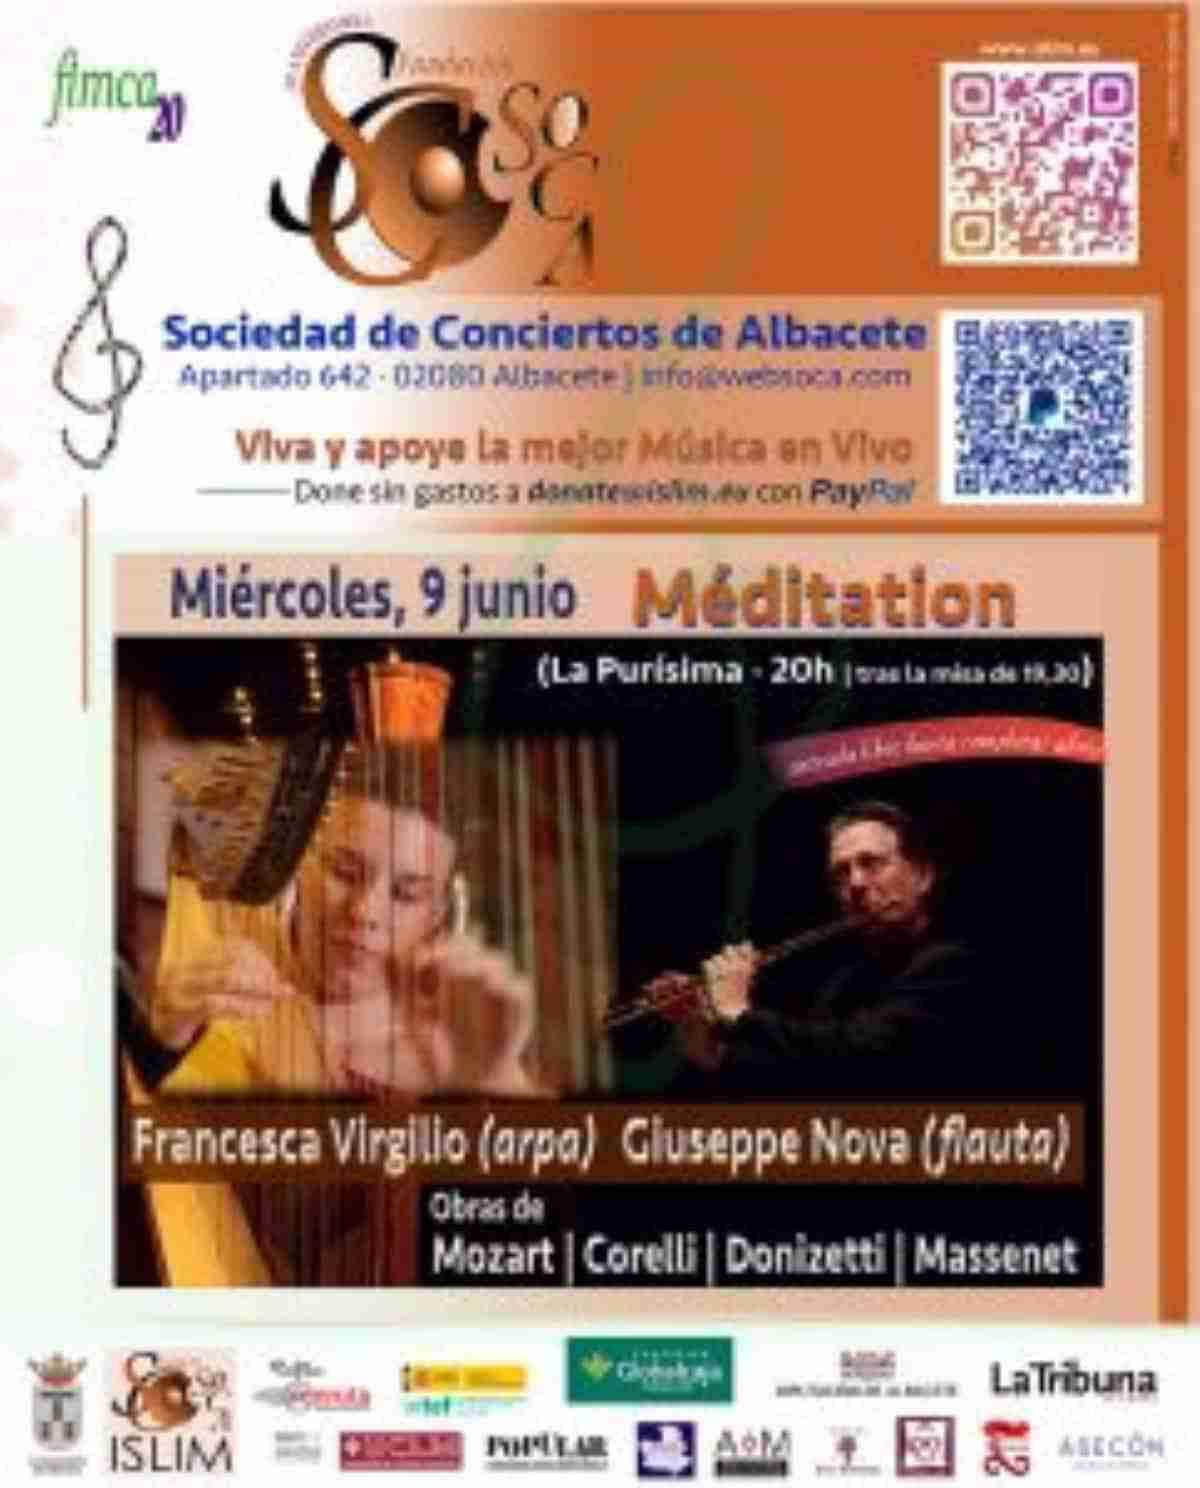 festival de musica de camara fimca albacete